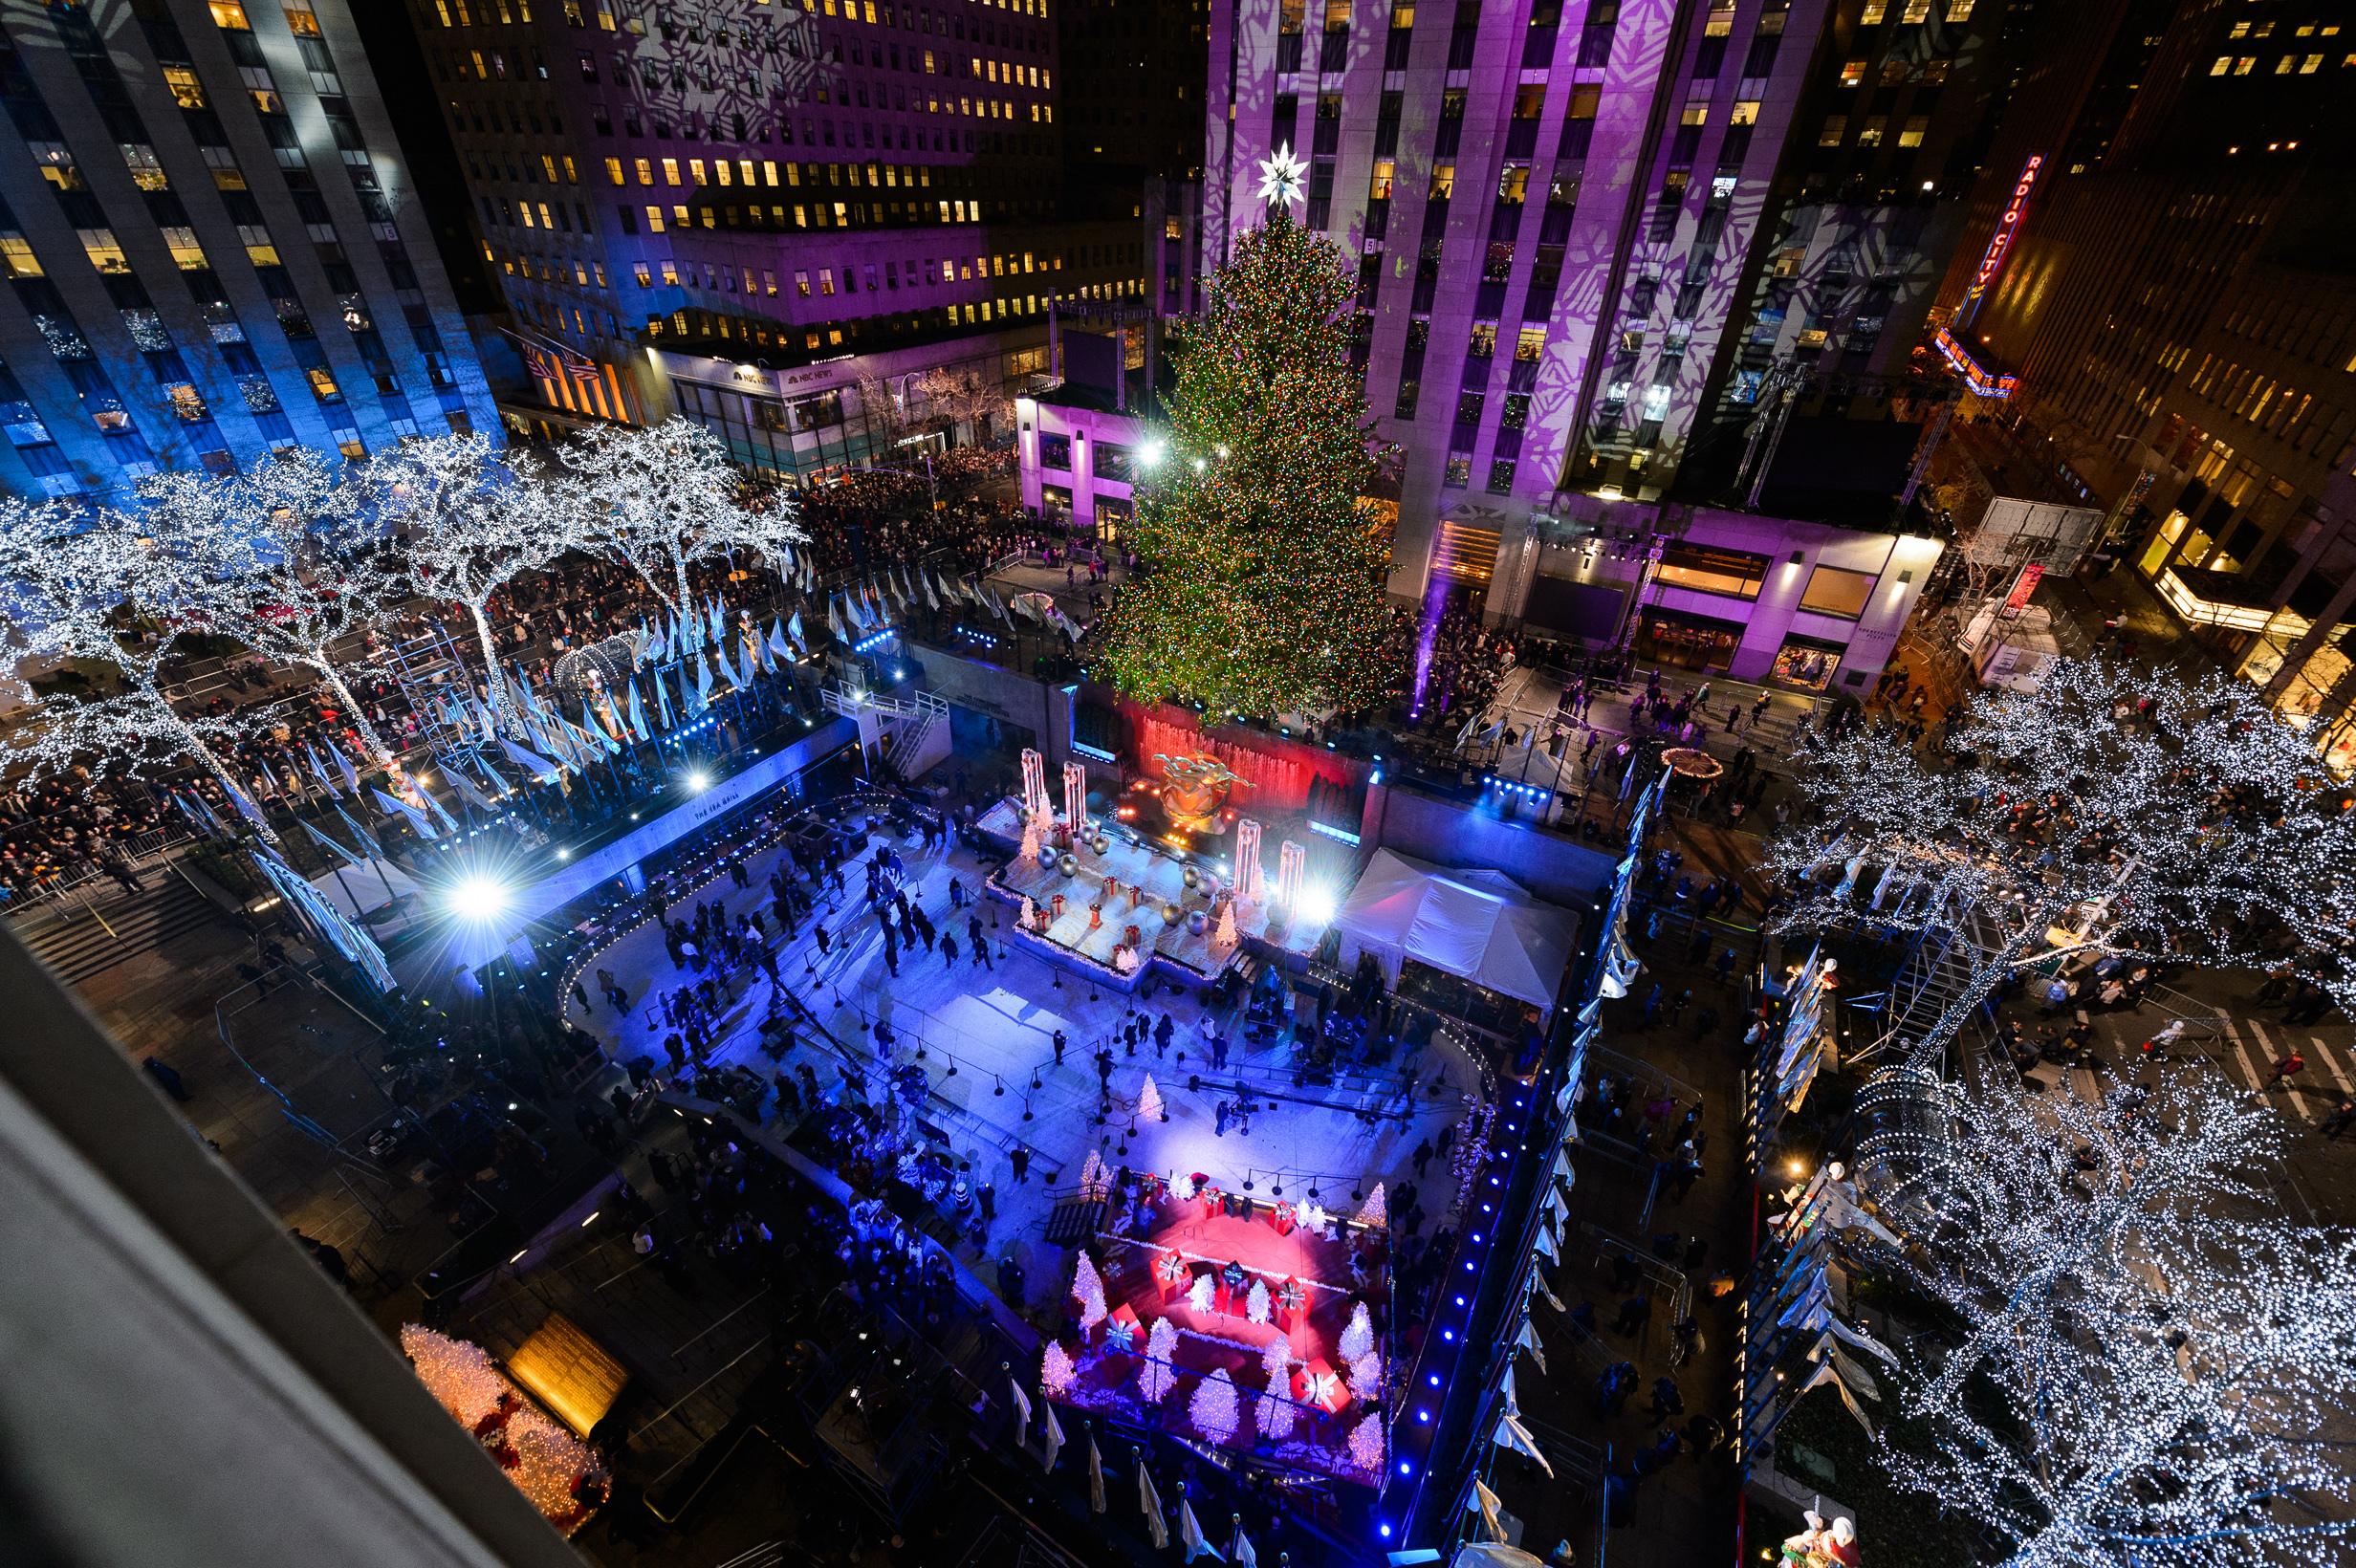 See the Rockefeller tree lighting in NYC